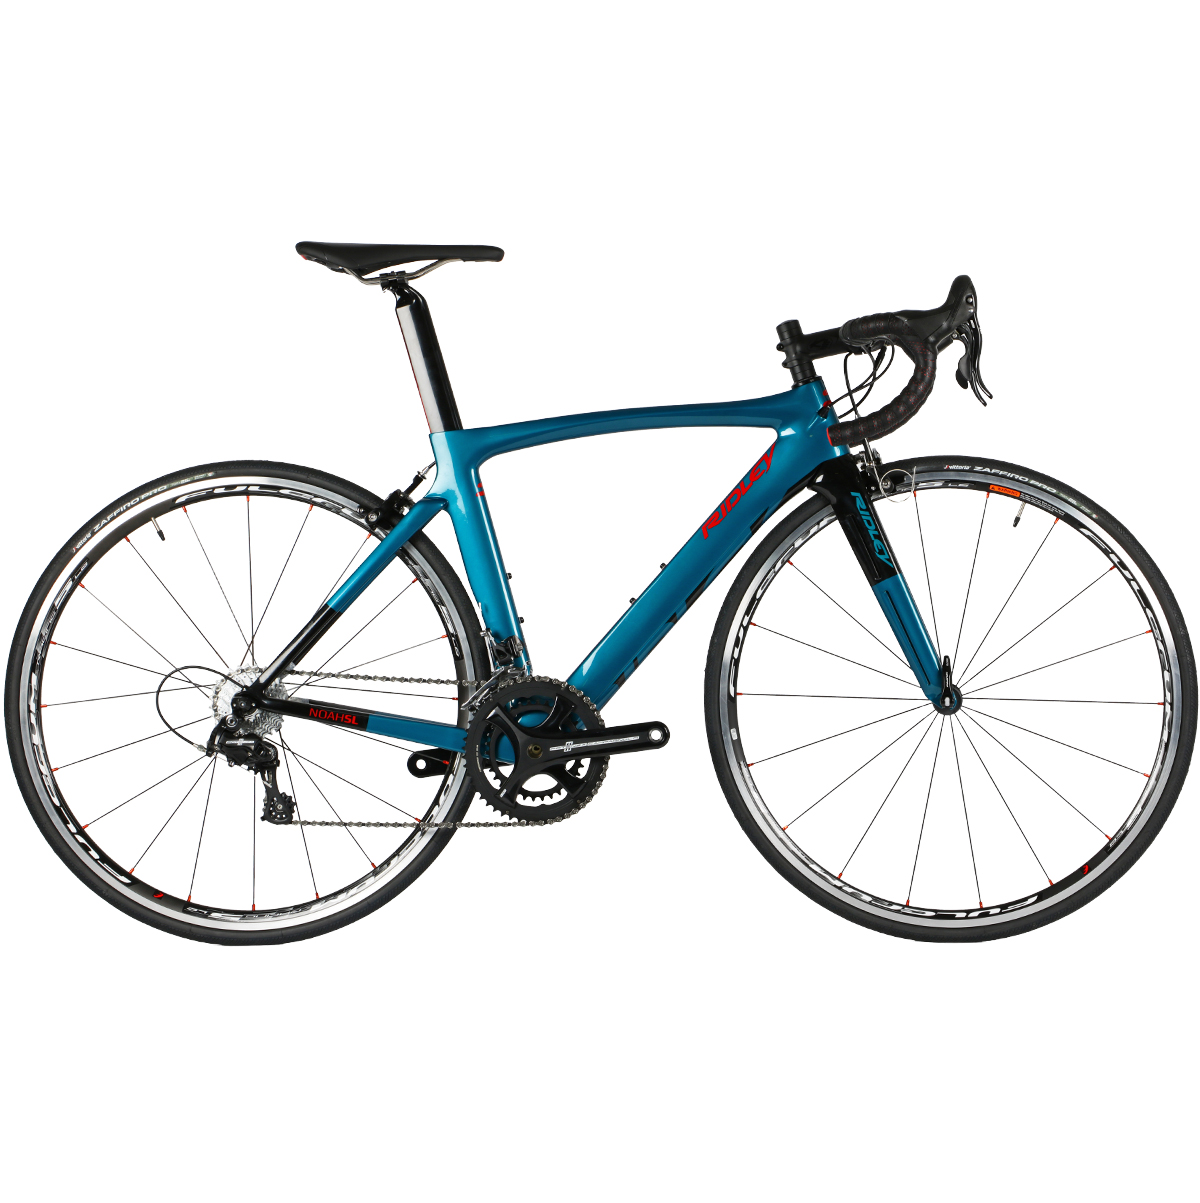 Ridley Noah SL Potenza Carbon Road Bike - 2018